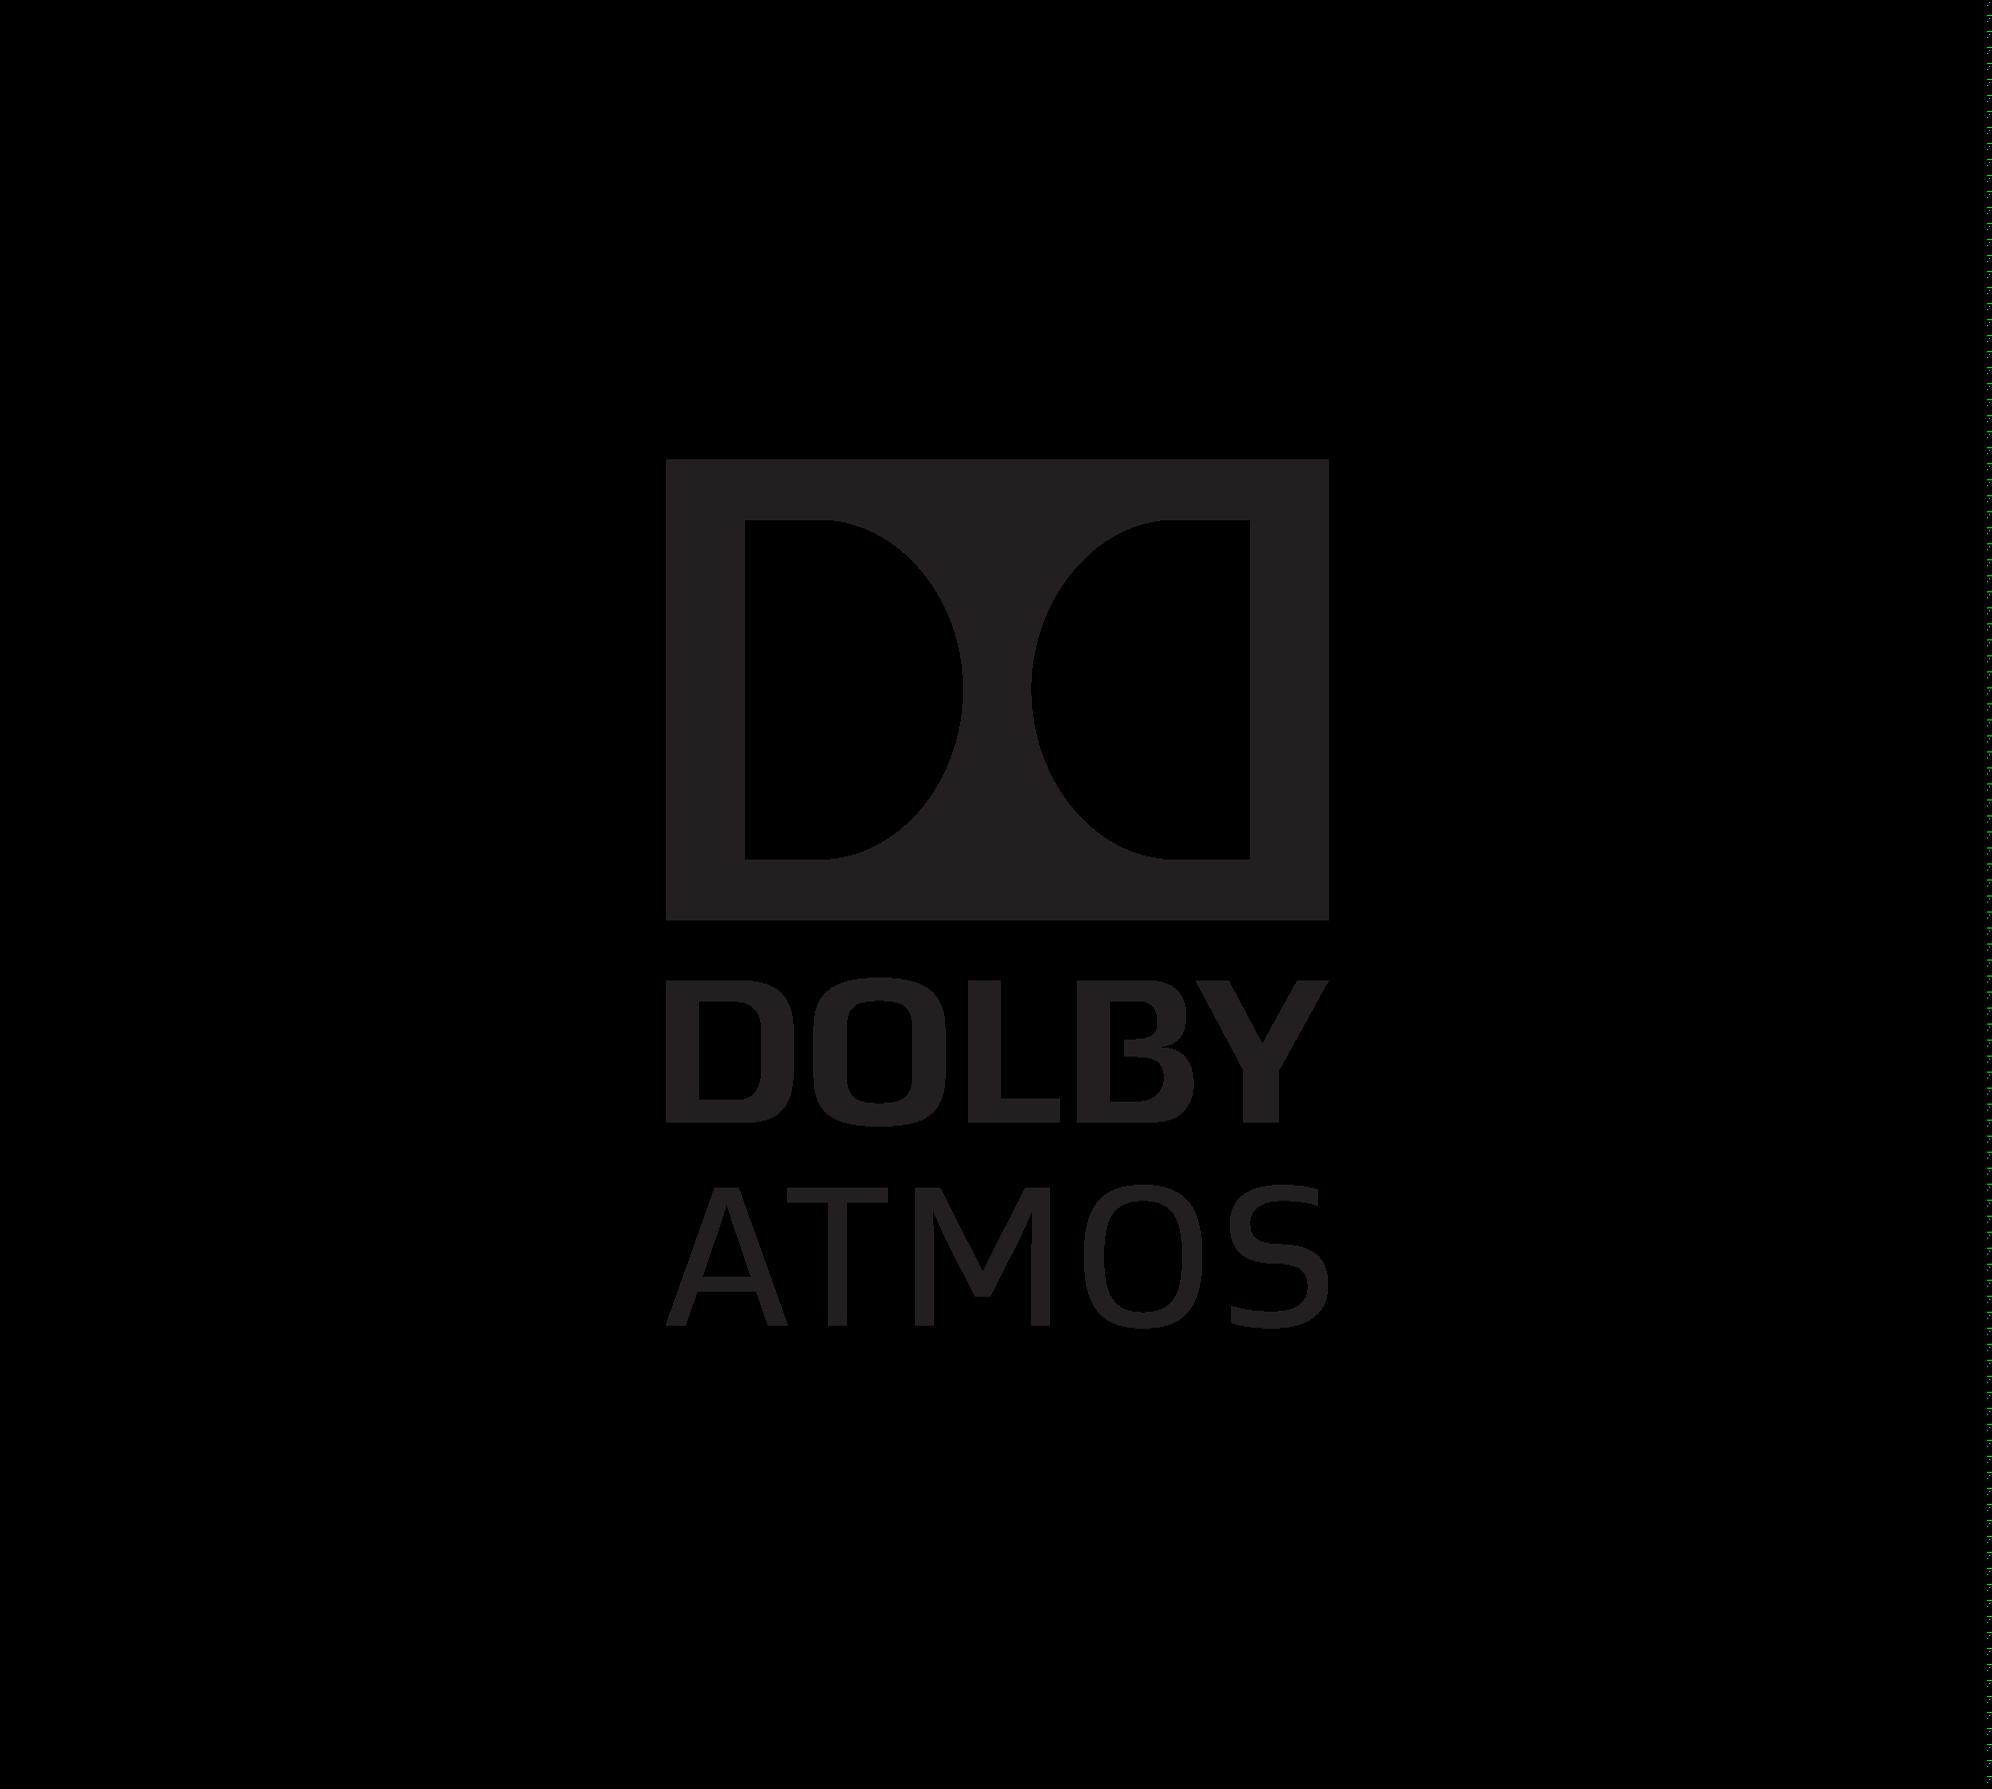 developer.dolby.com